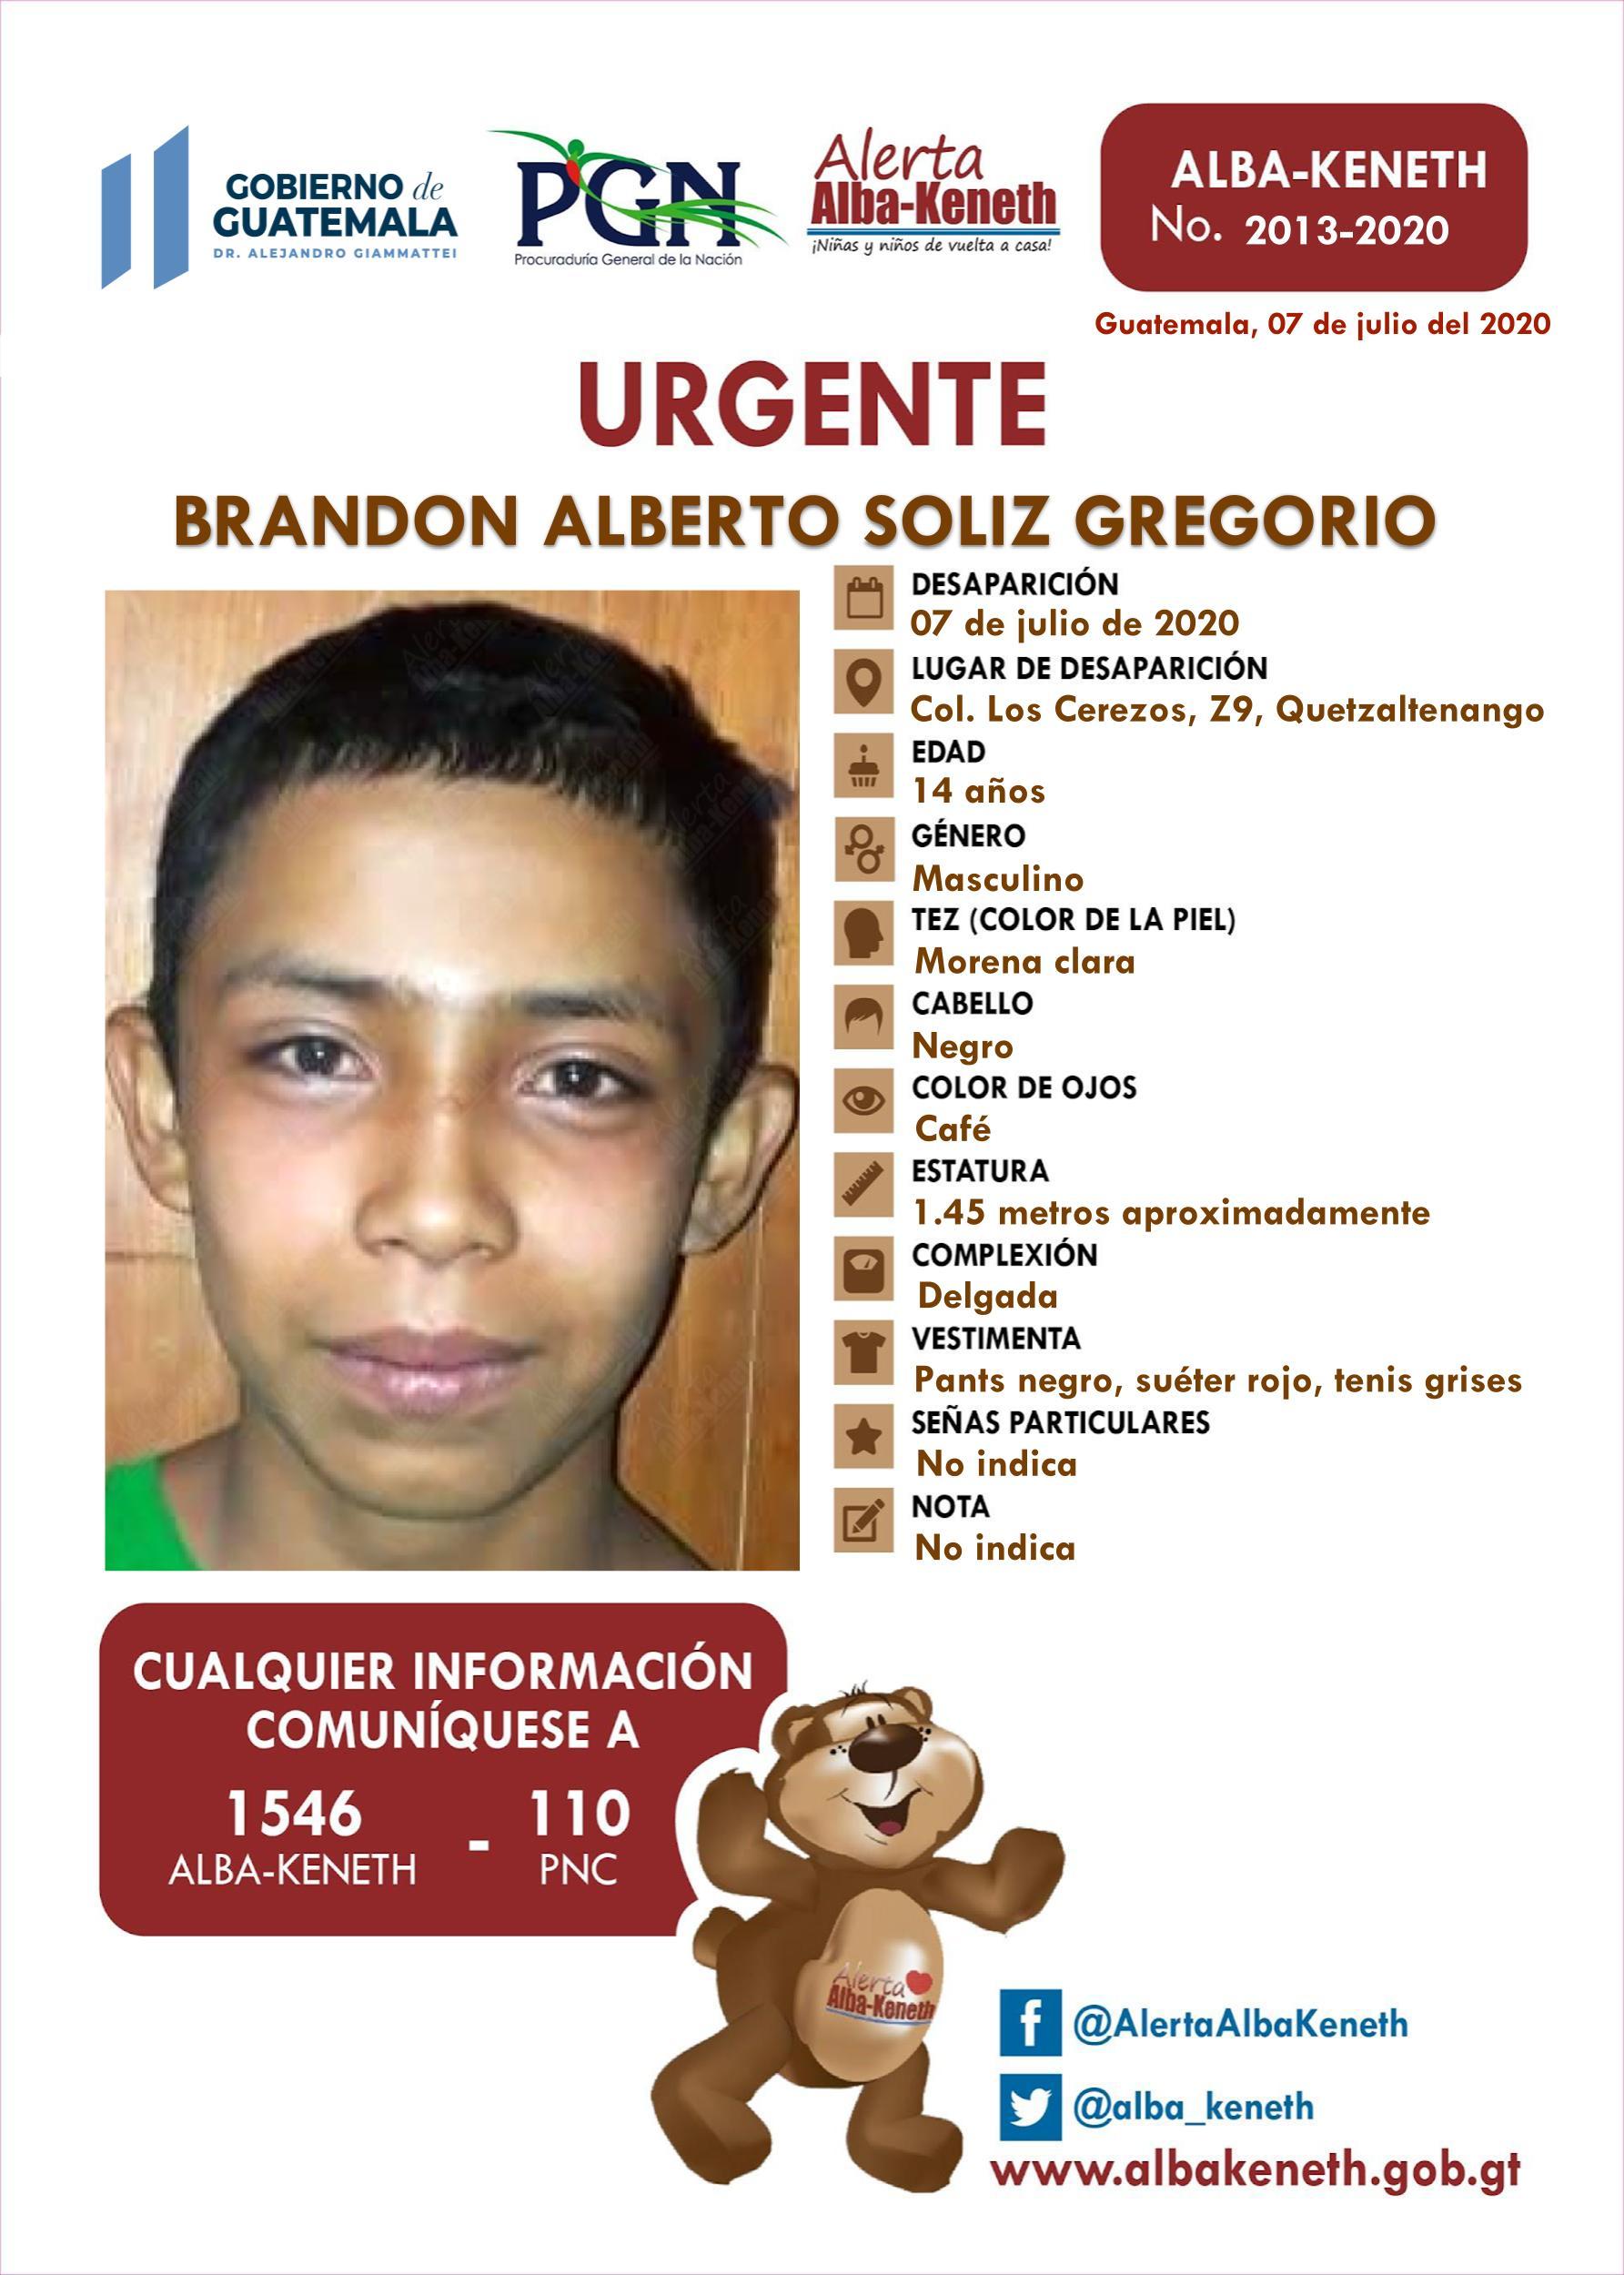 Brandon Alberto Soliz Gregorio